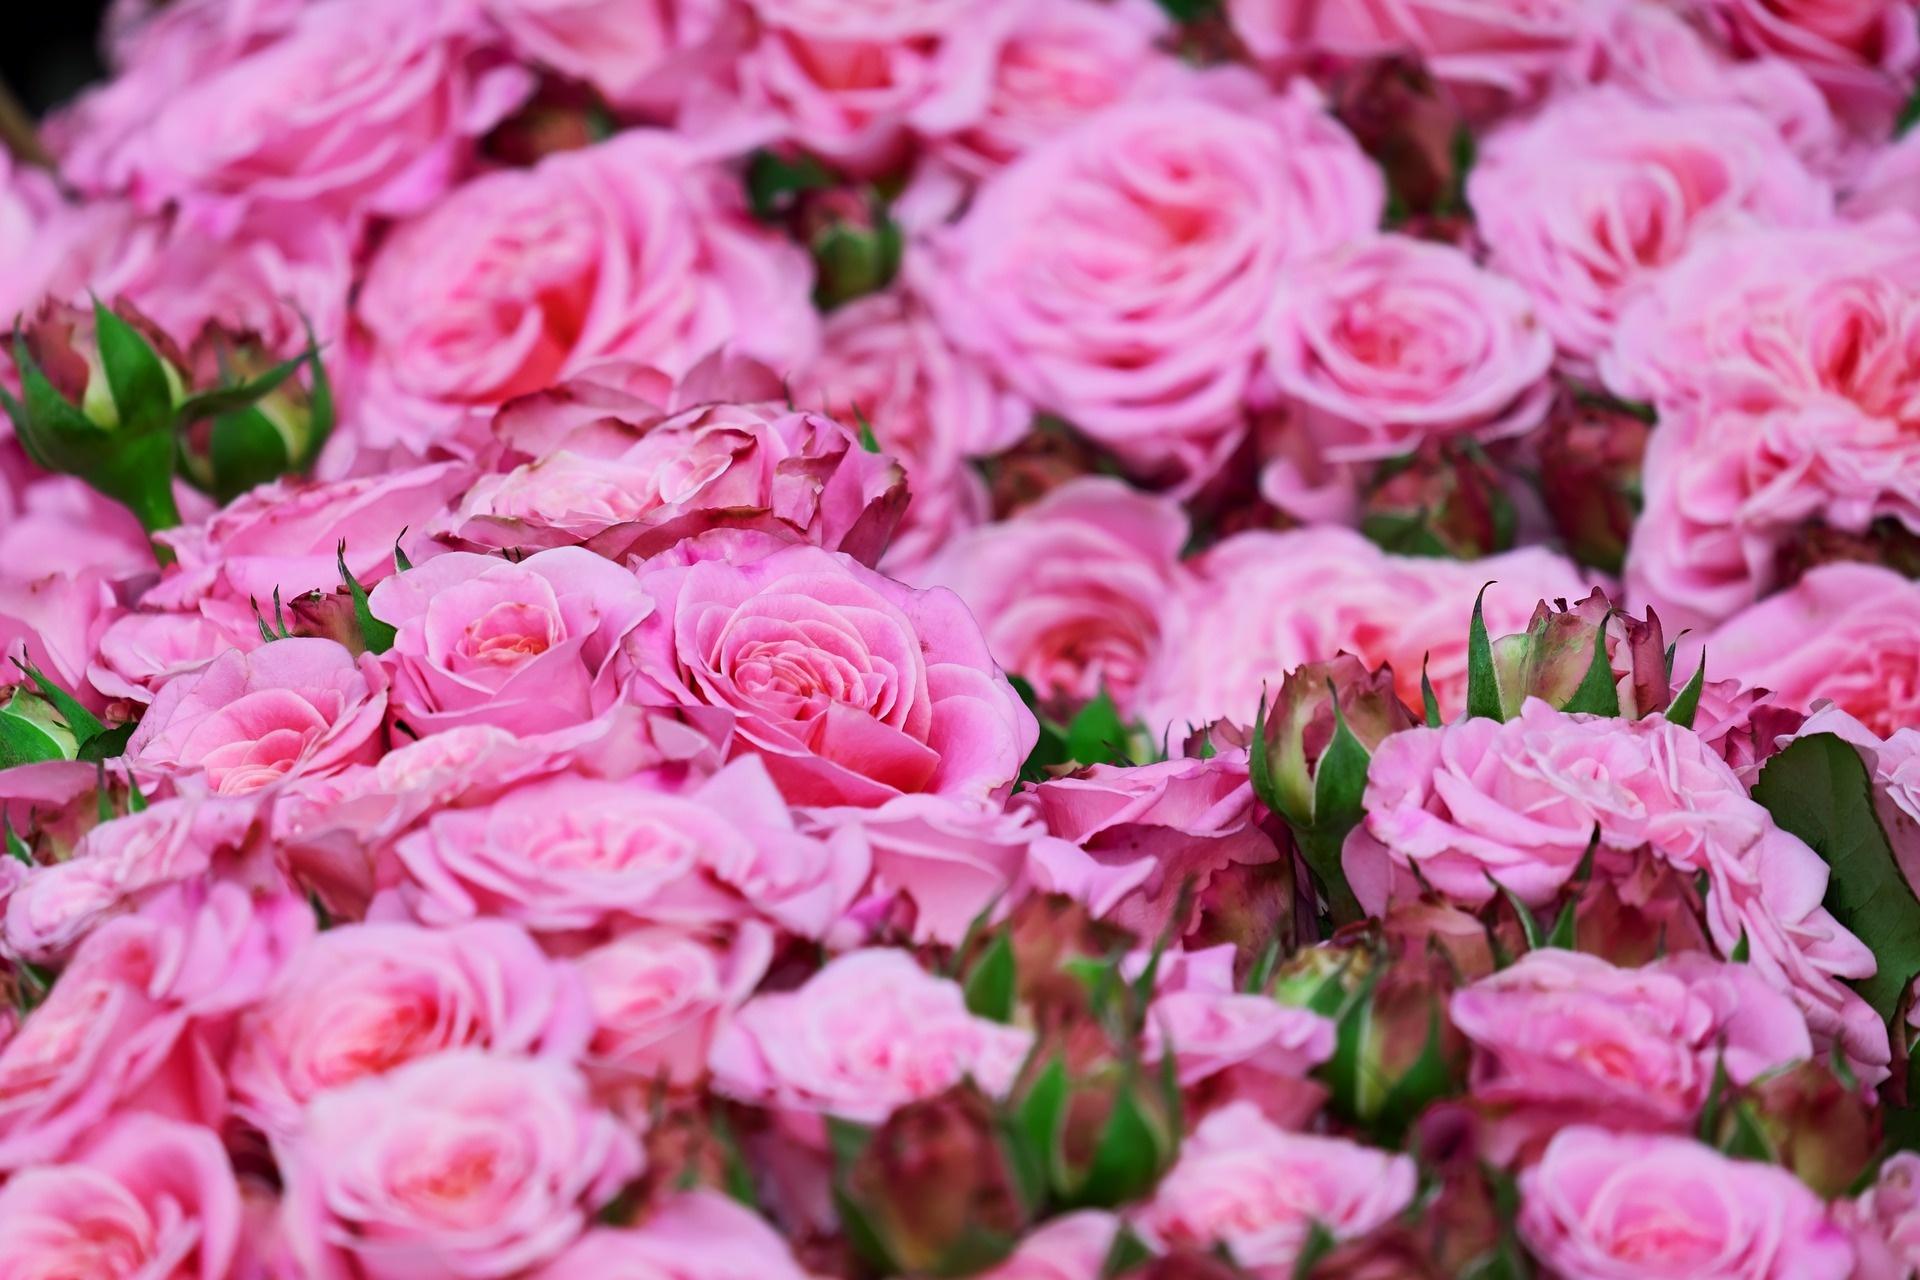 Rosenöl aus Damaszenerrose vom Tiroler Kräuterhof